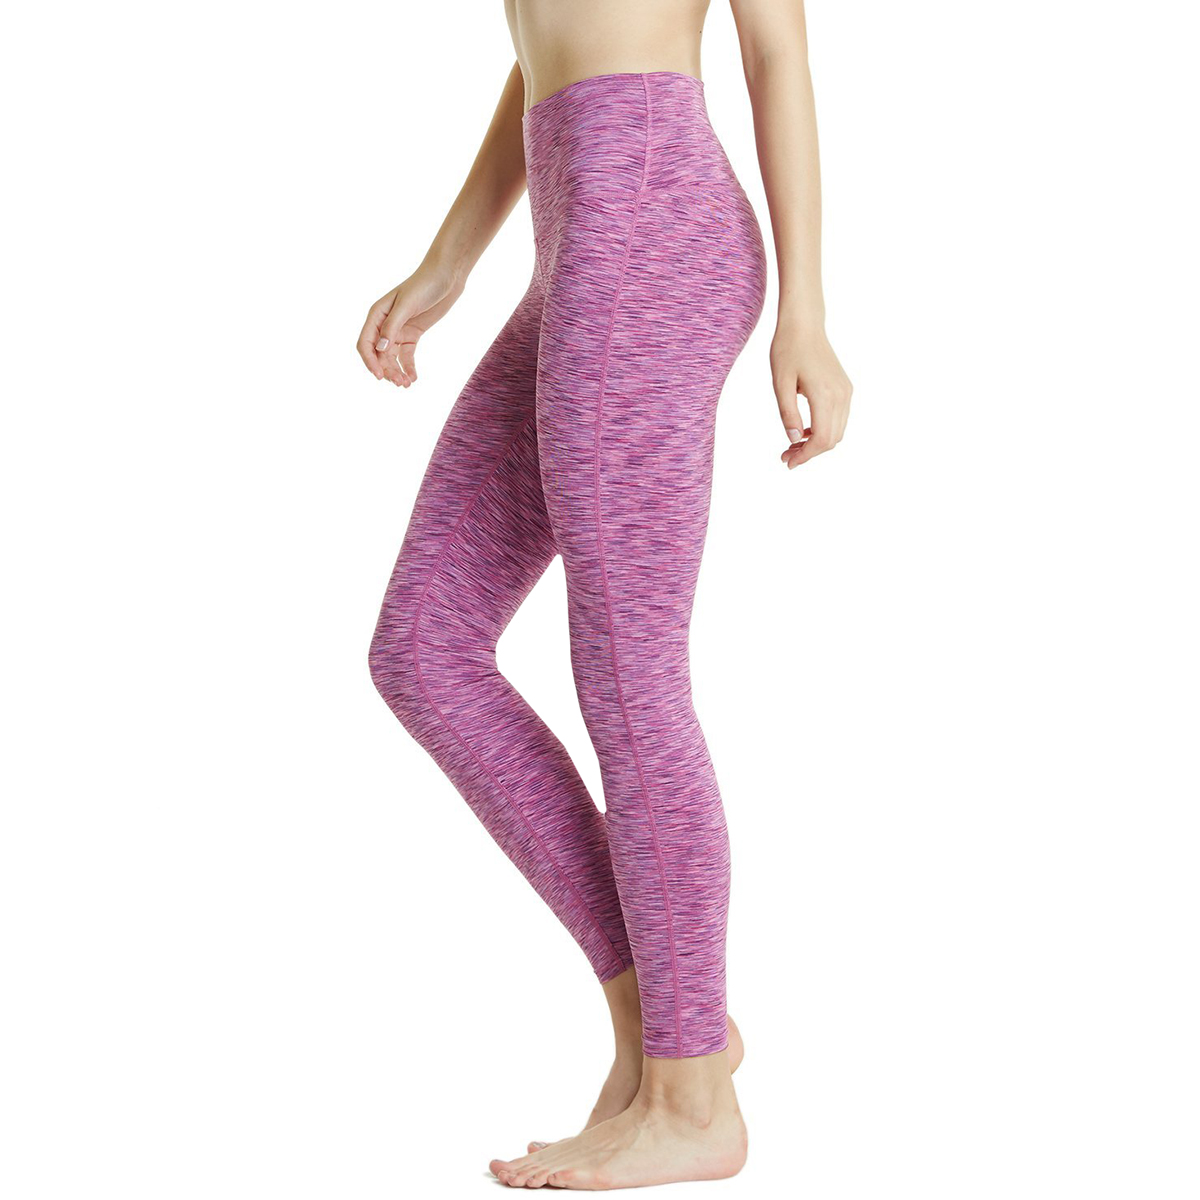 thumbnail 96 - TSLA Tesla FYP42 Women's High-Waisted Ultra-Stretch Tummy Control Yoga Pants